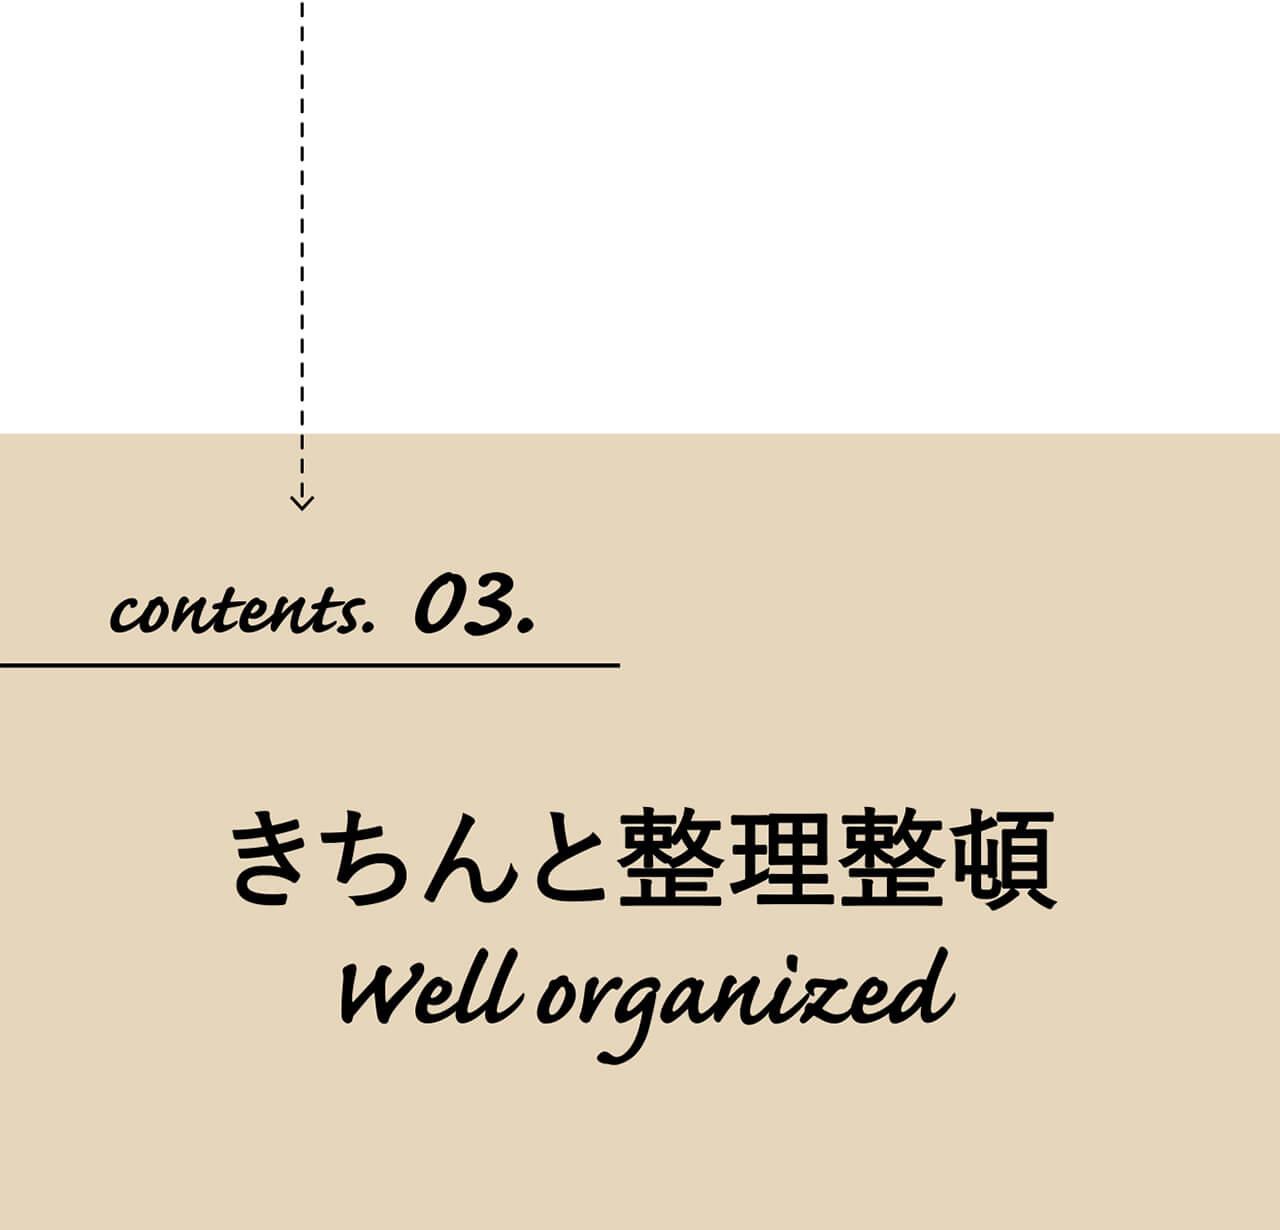 contents.03.おしゃれに整理整頓 Well organized.